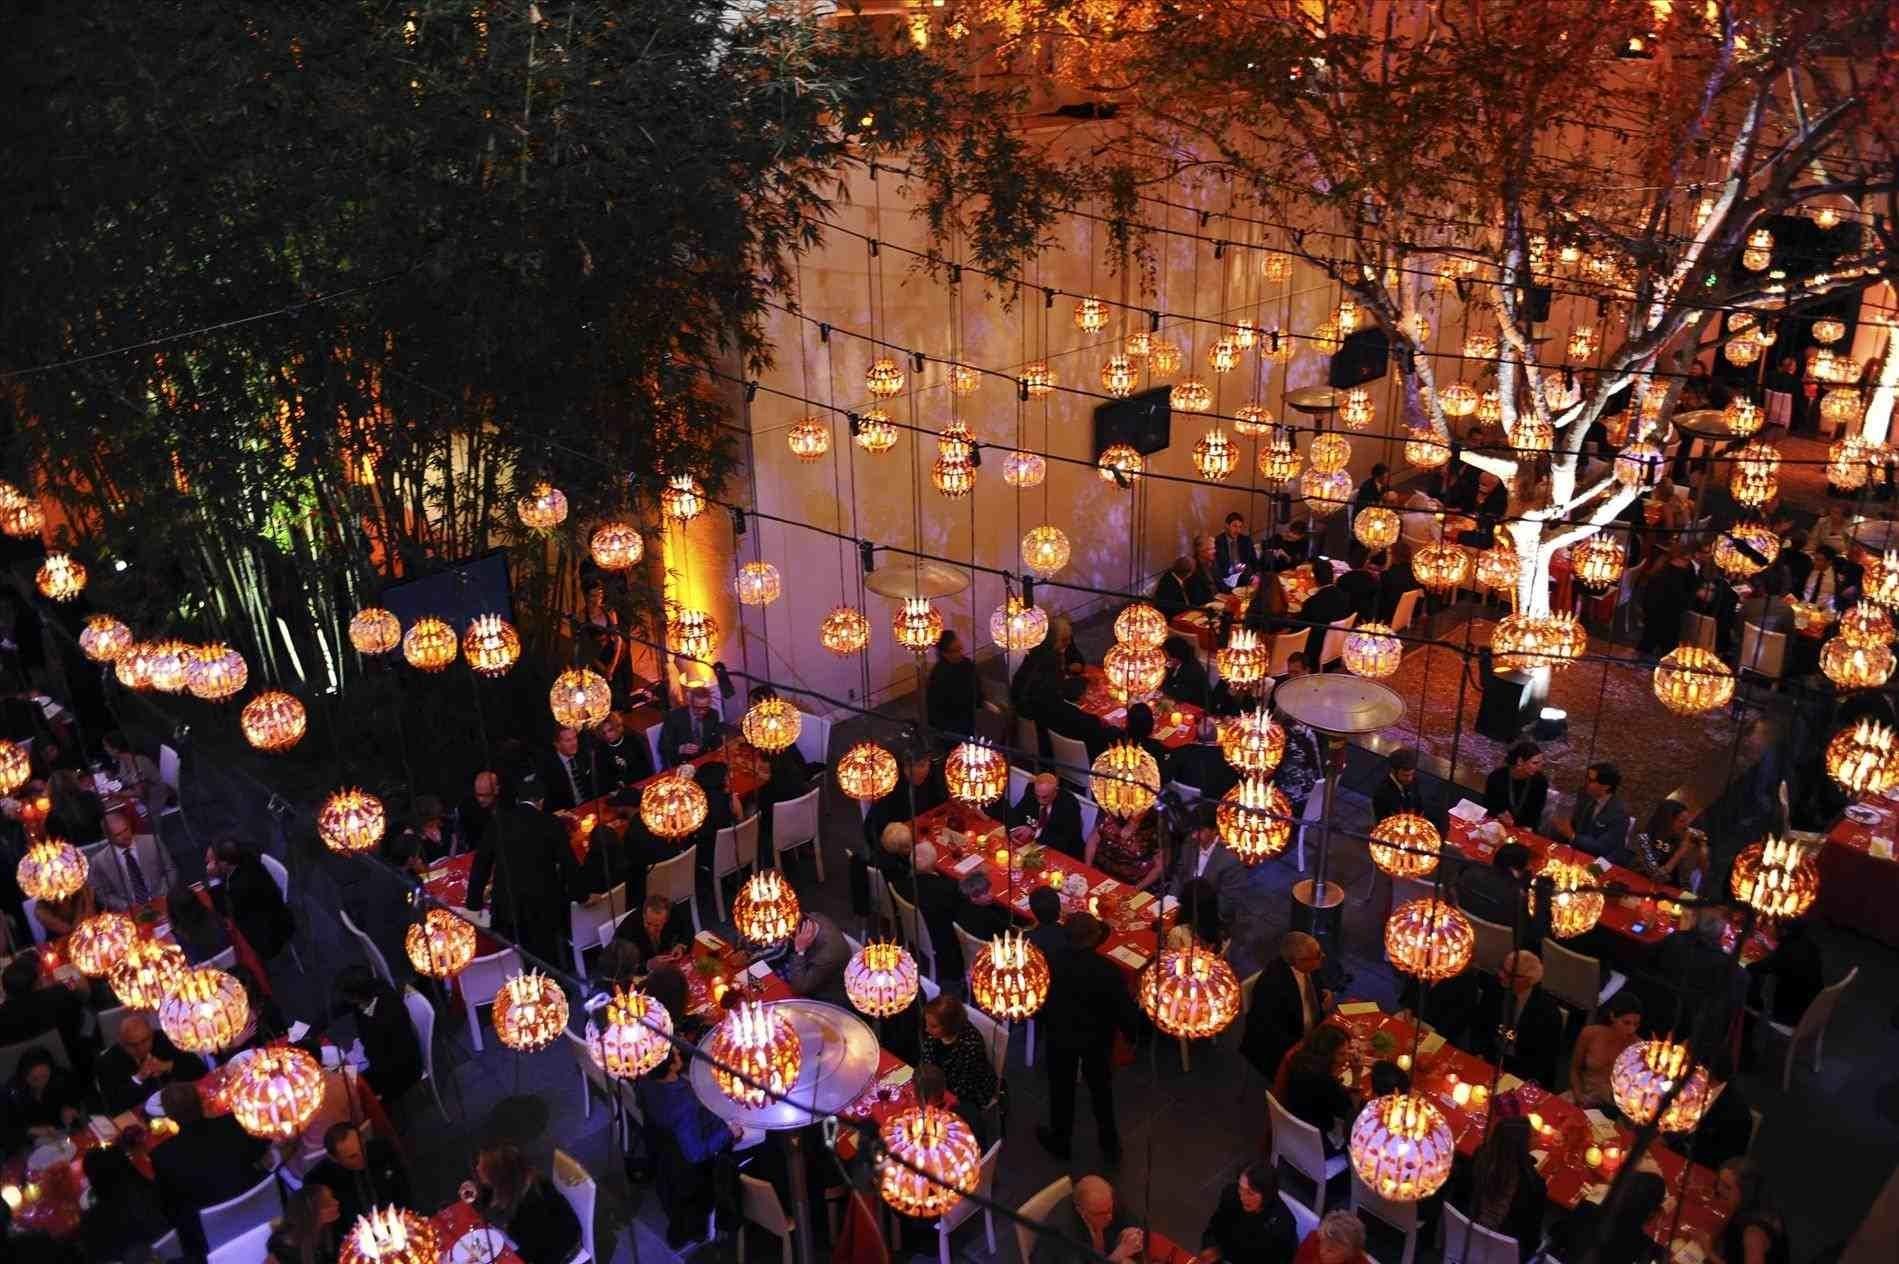 Rhlightingcom Fine Outdoor Hanging Light Bulbs Art Lamps Devonshire Regarding Outdoor Hanging Lights Bulbs (View 13 of 15)